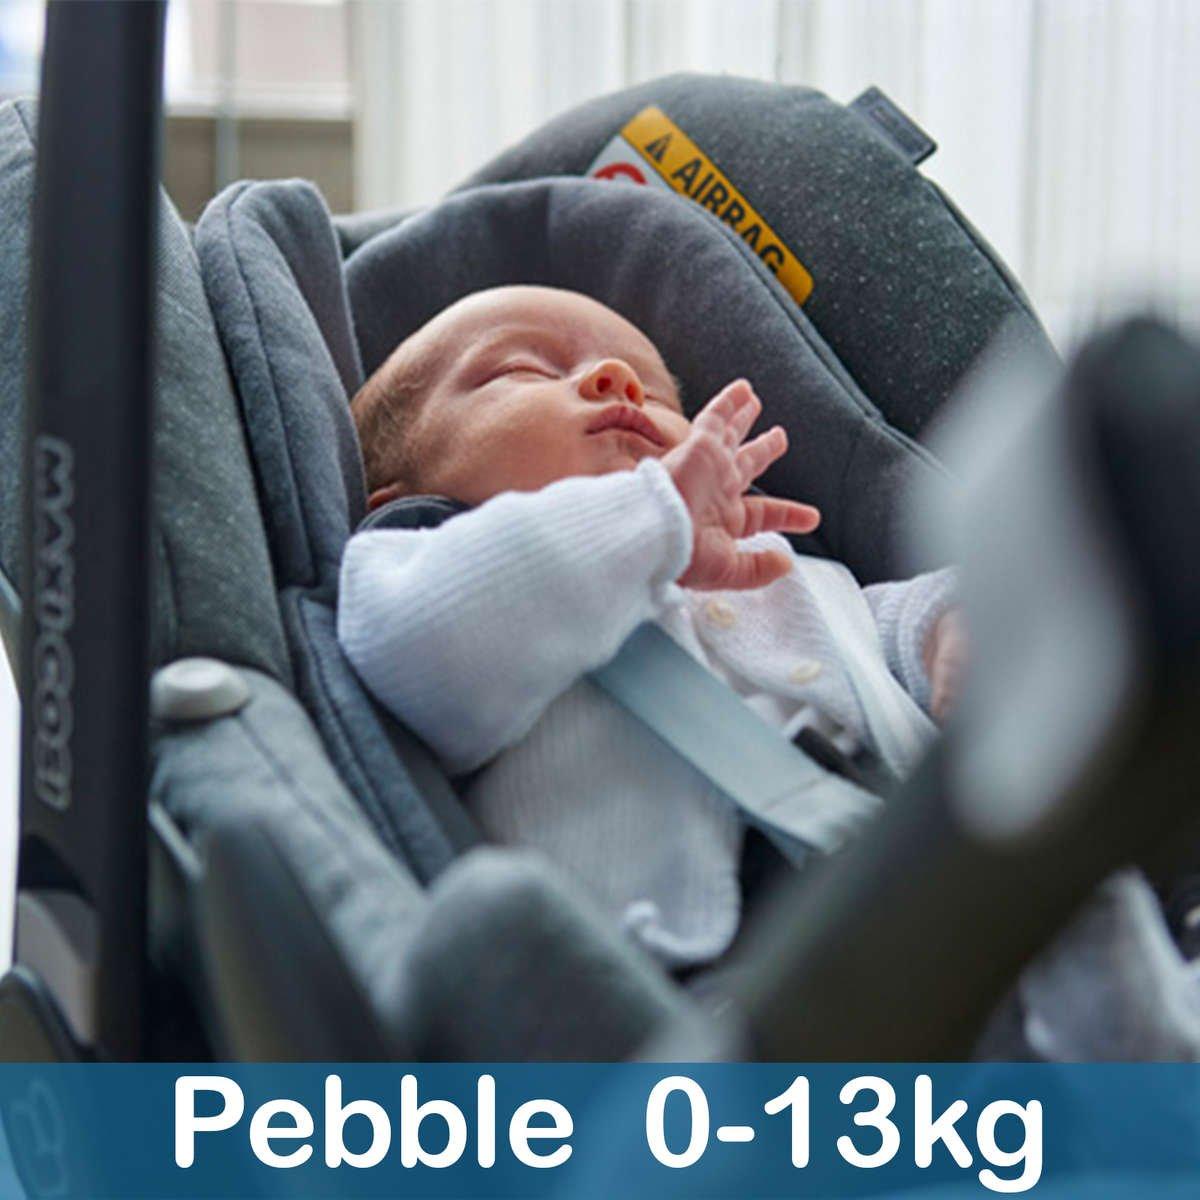 maxi cosi pebble